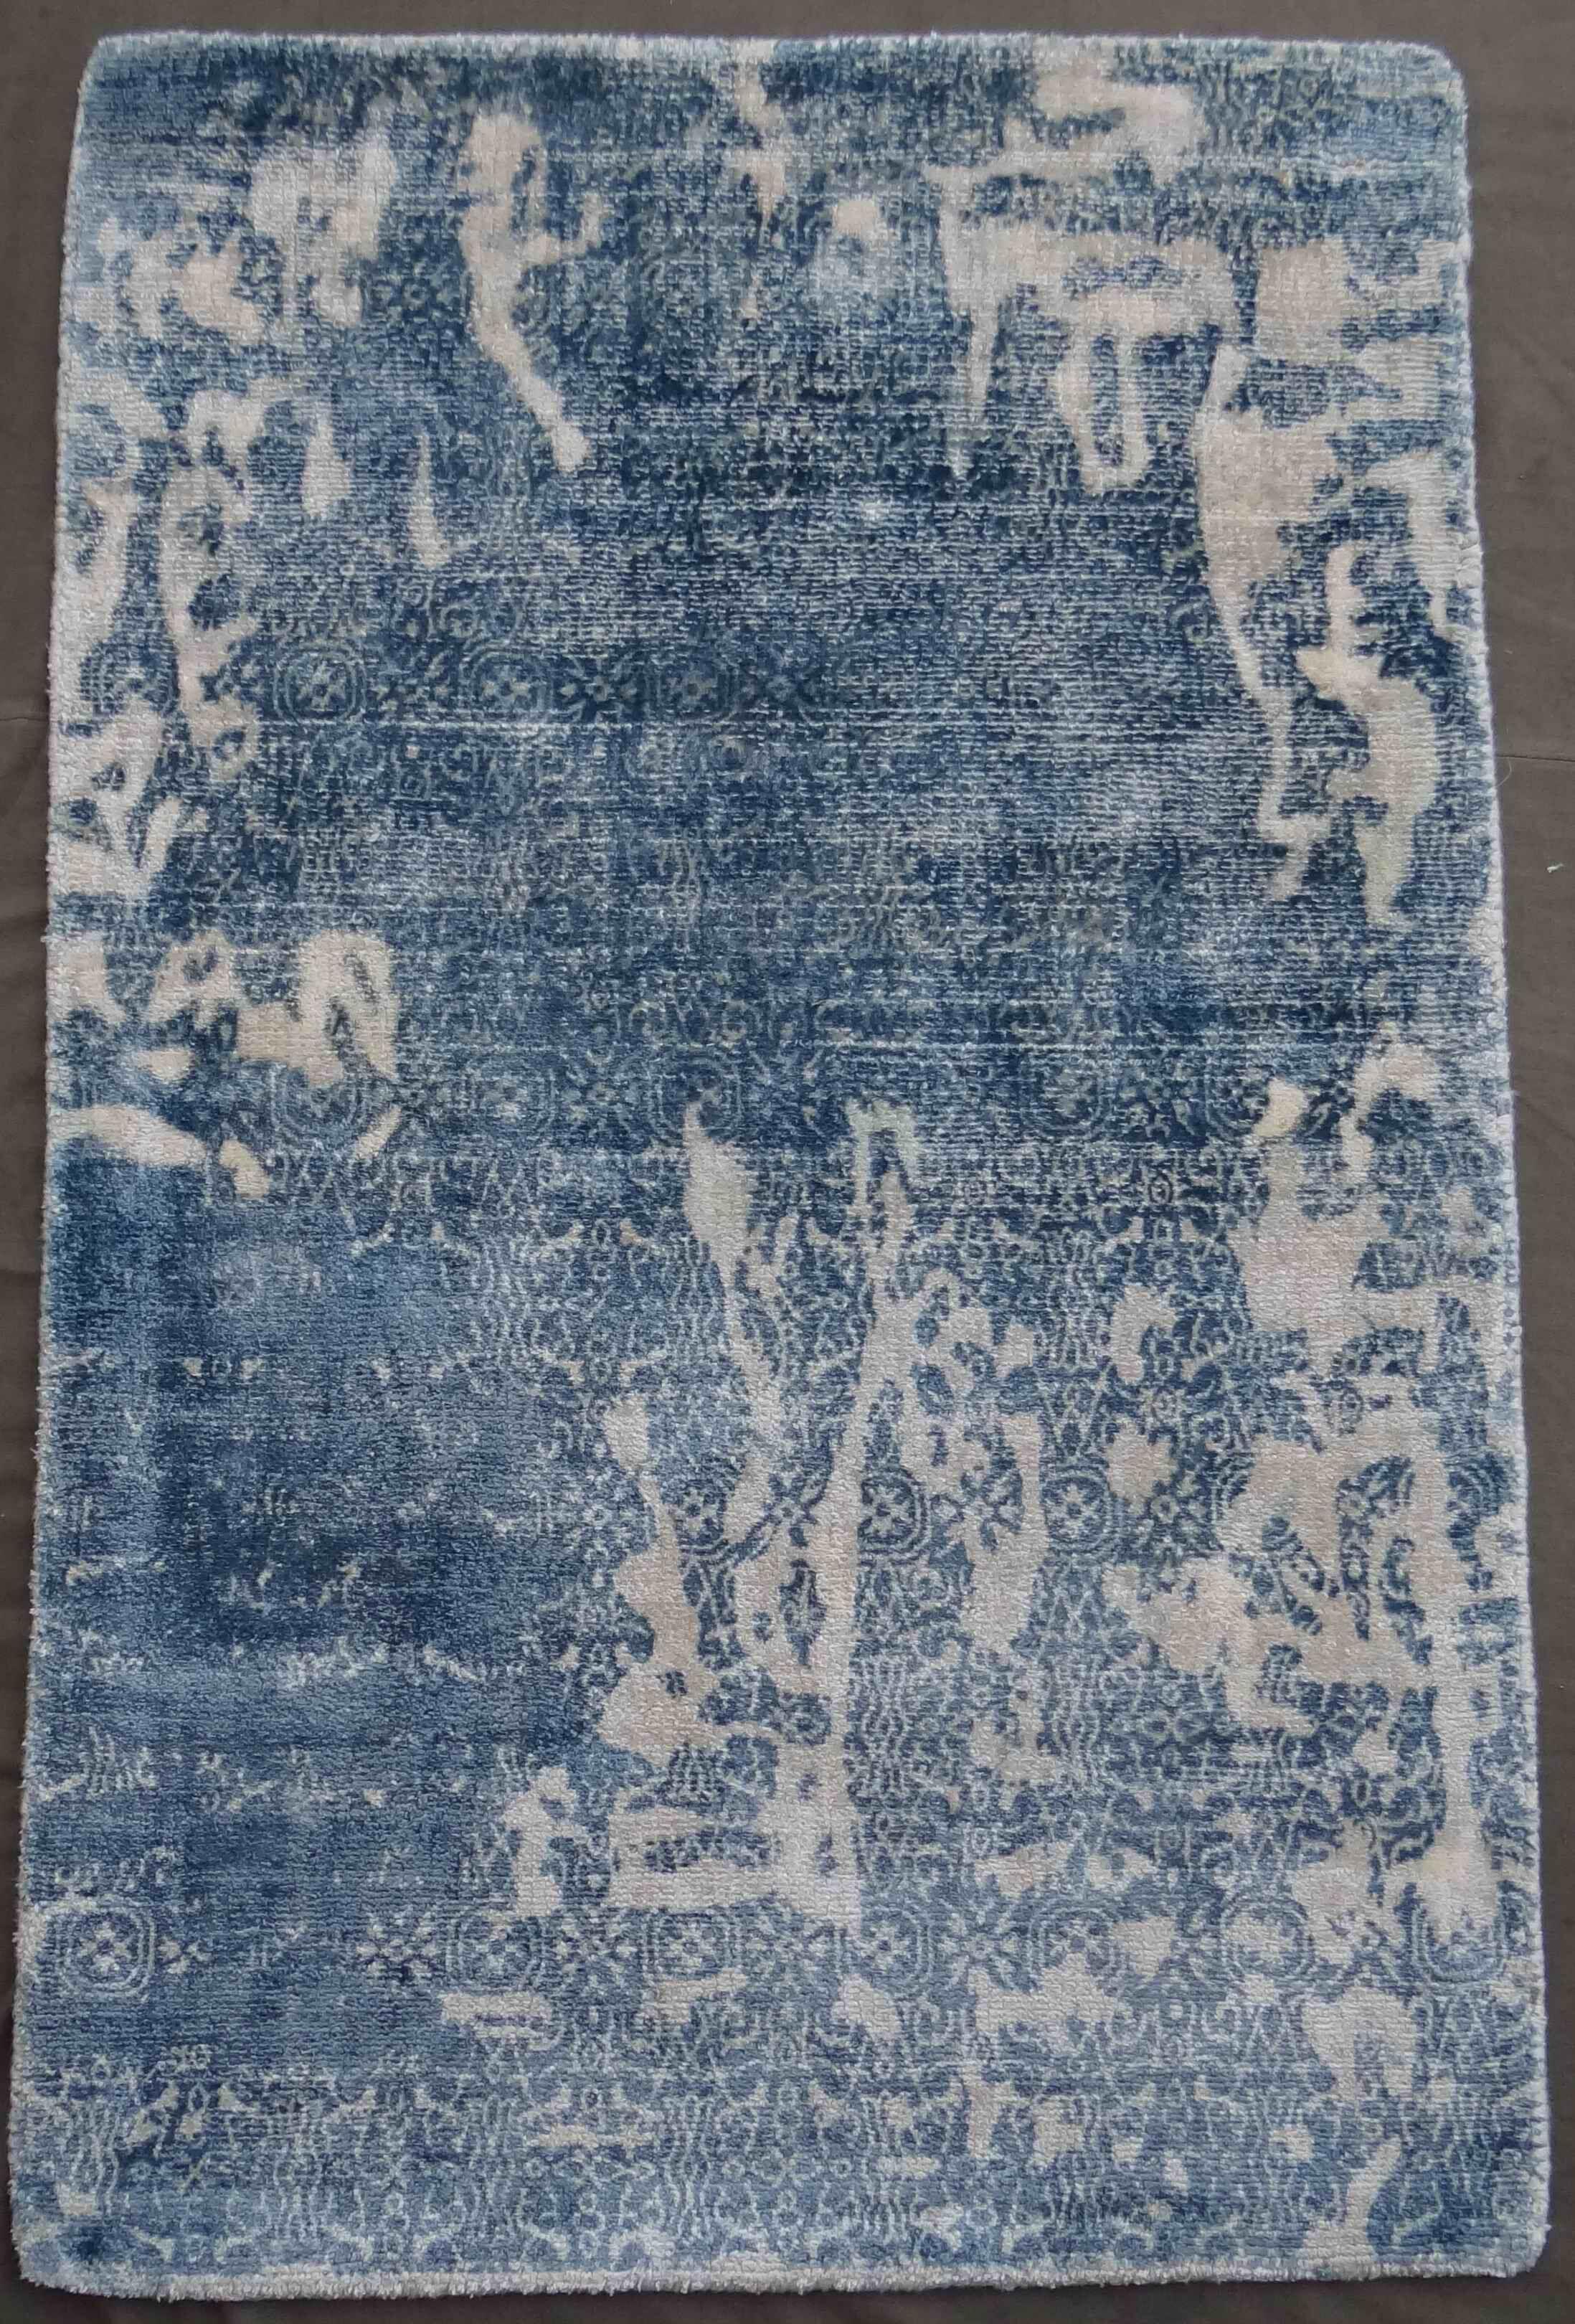 Carmen Hand-Woven Blue Area Rug Rug Size: Rectangle 6' x 9'